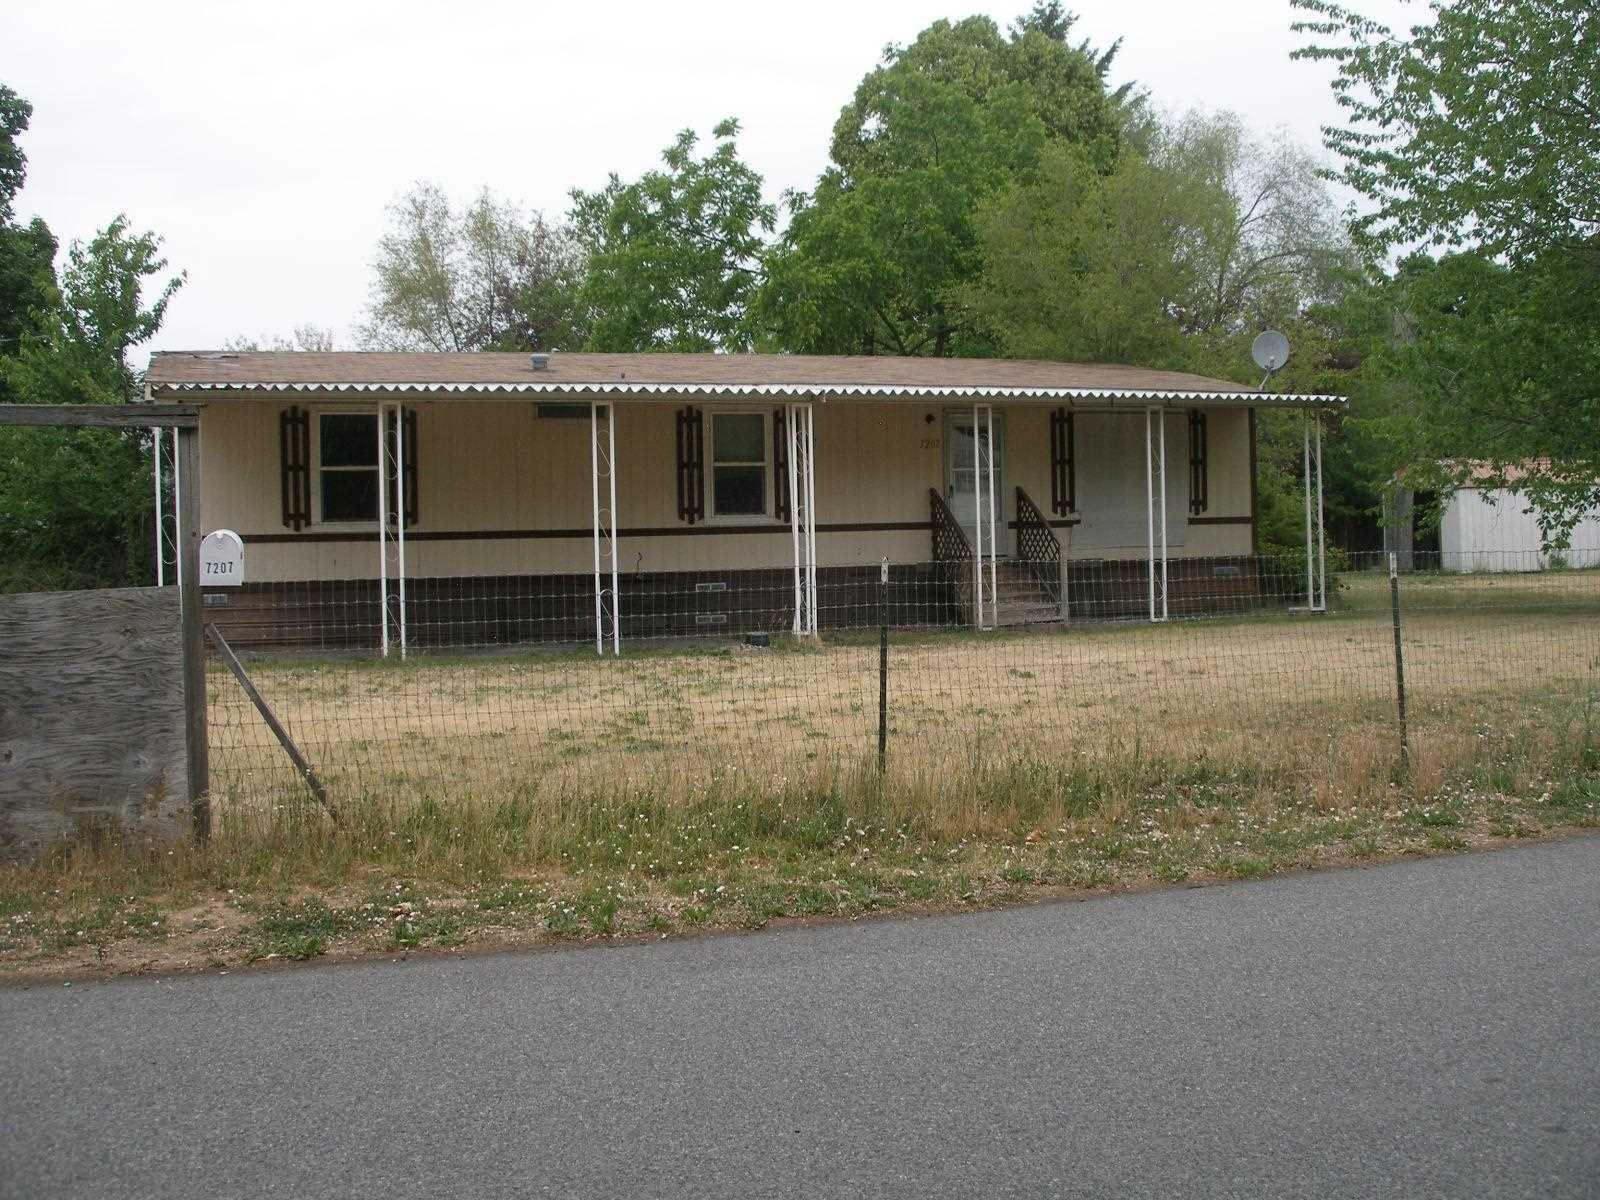 7207 E Fairview Ave, Spokane Valley, WA 99212 - #: 202117264